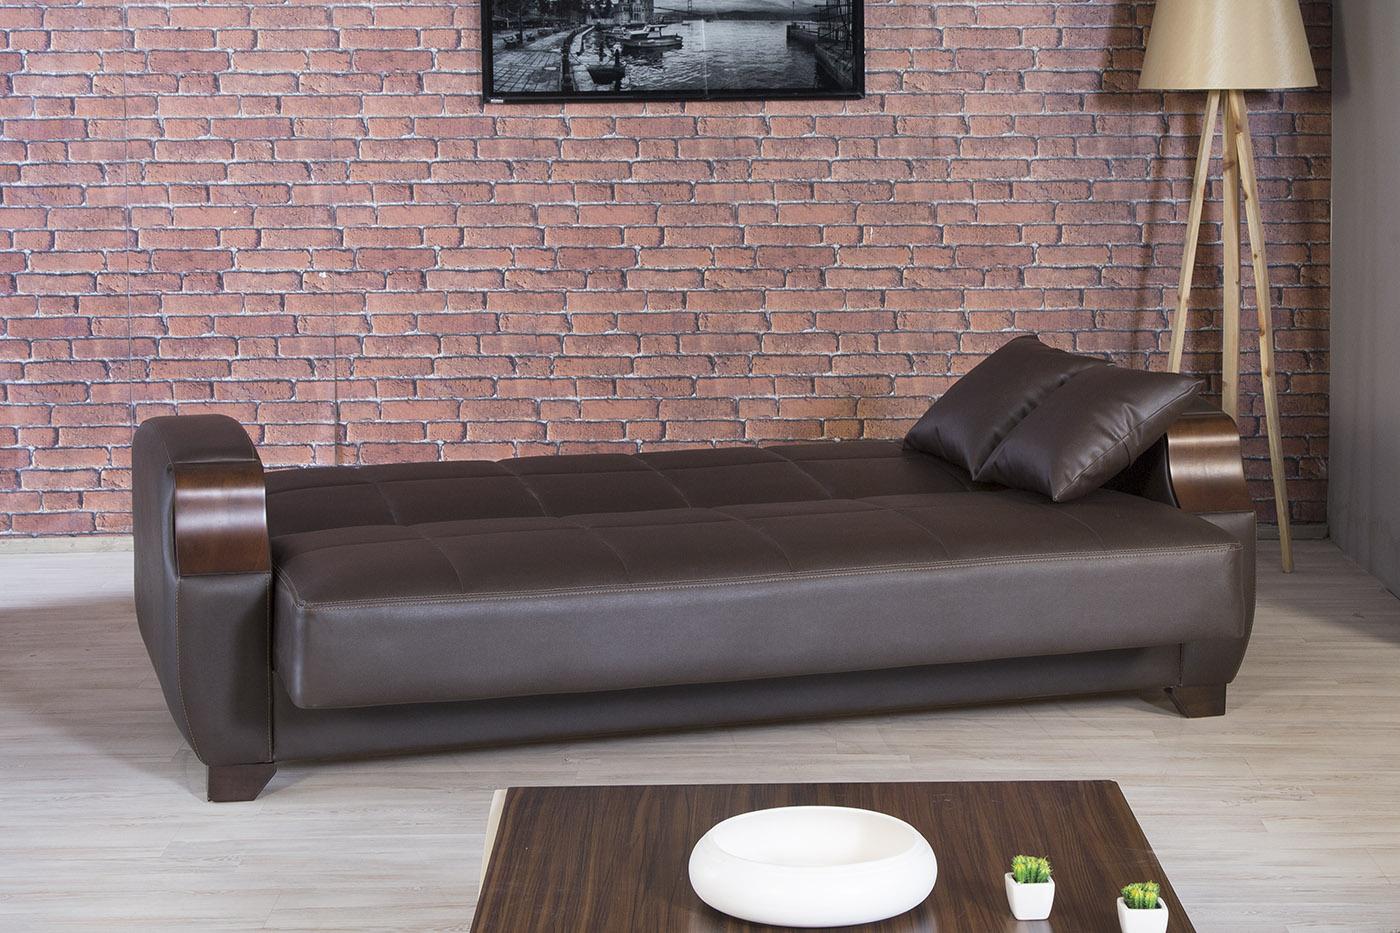 Euro moda zen brown leatherette sofa by casamode for Sofa 99 euro